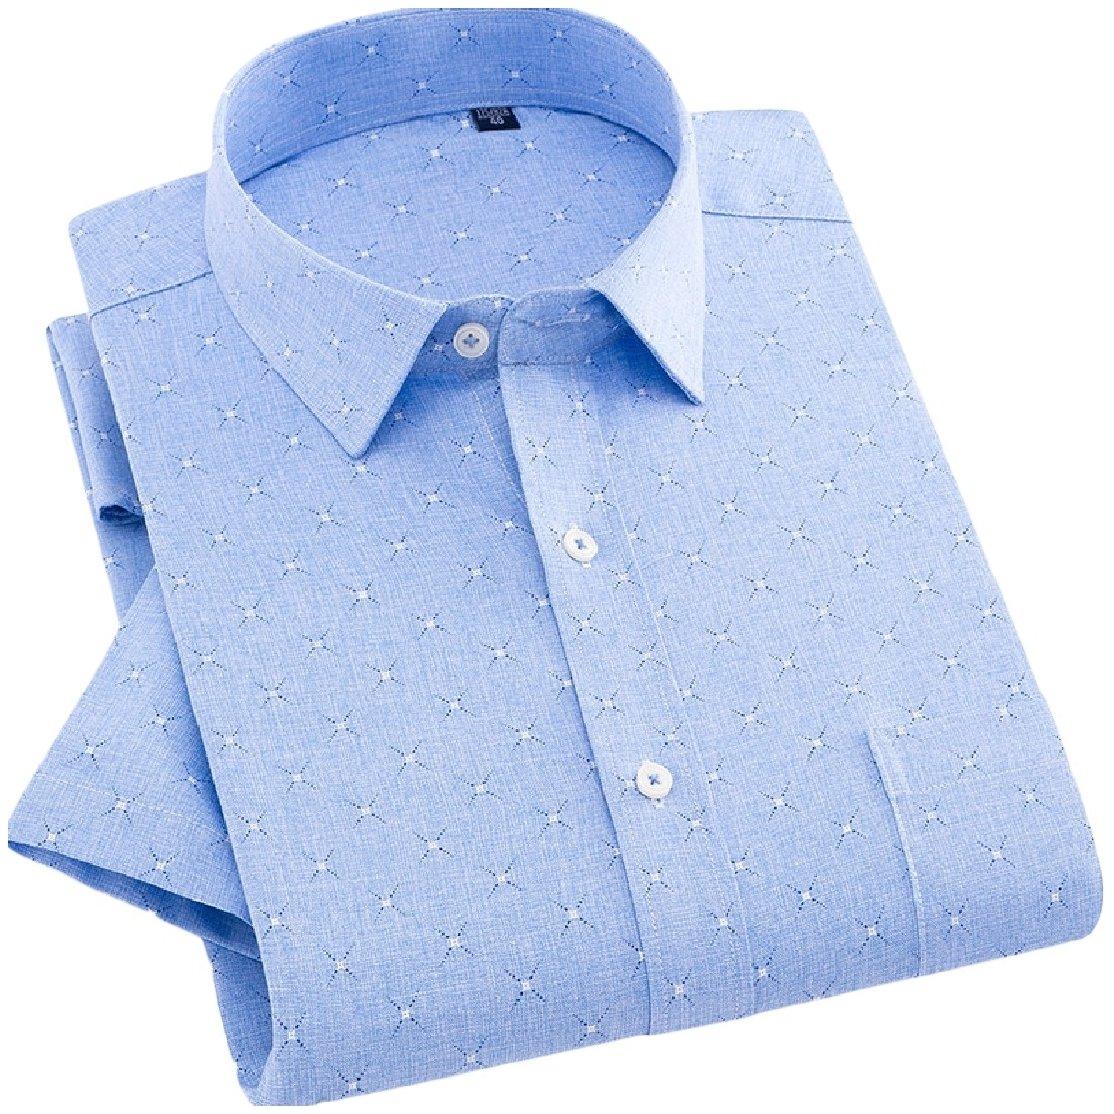 YUNY Mens Business Cardi Short Sleeve Linen Half Sleeve Square Collar Shirt AS13 3XL